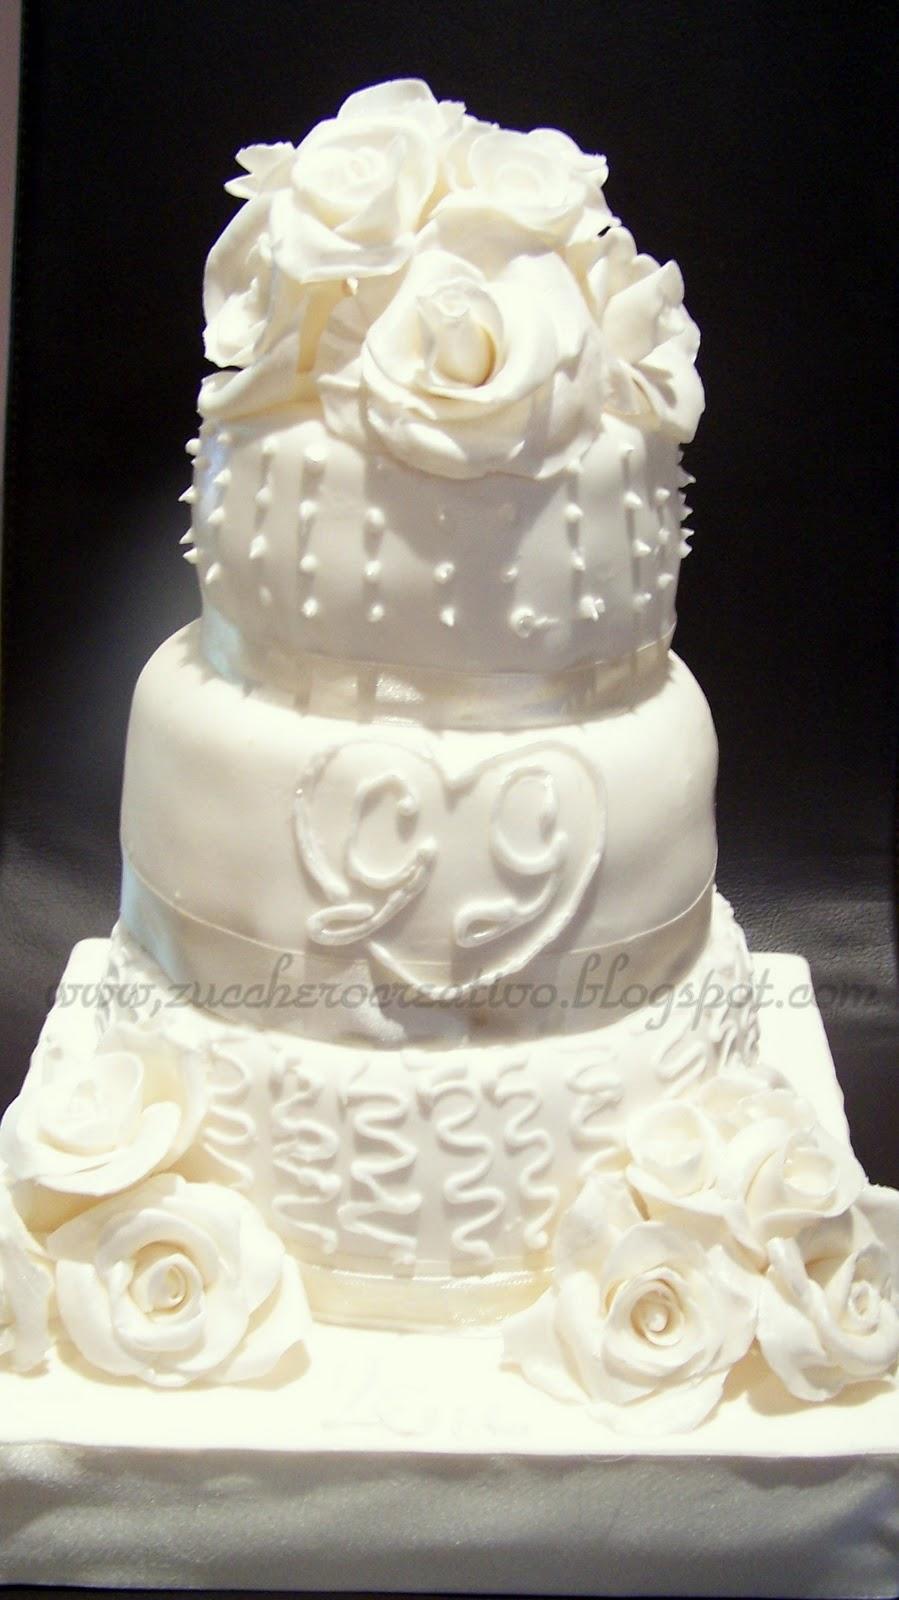 Torta nuziale per anniversario di matrimonio zucchero for Anniversario di matrimonio